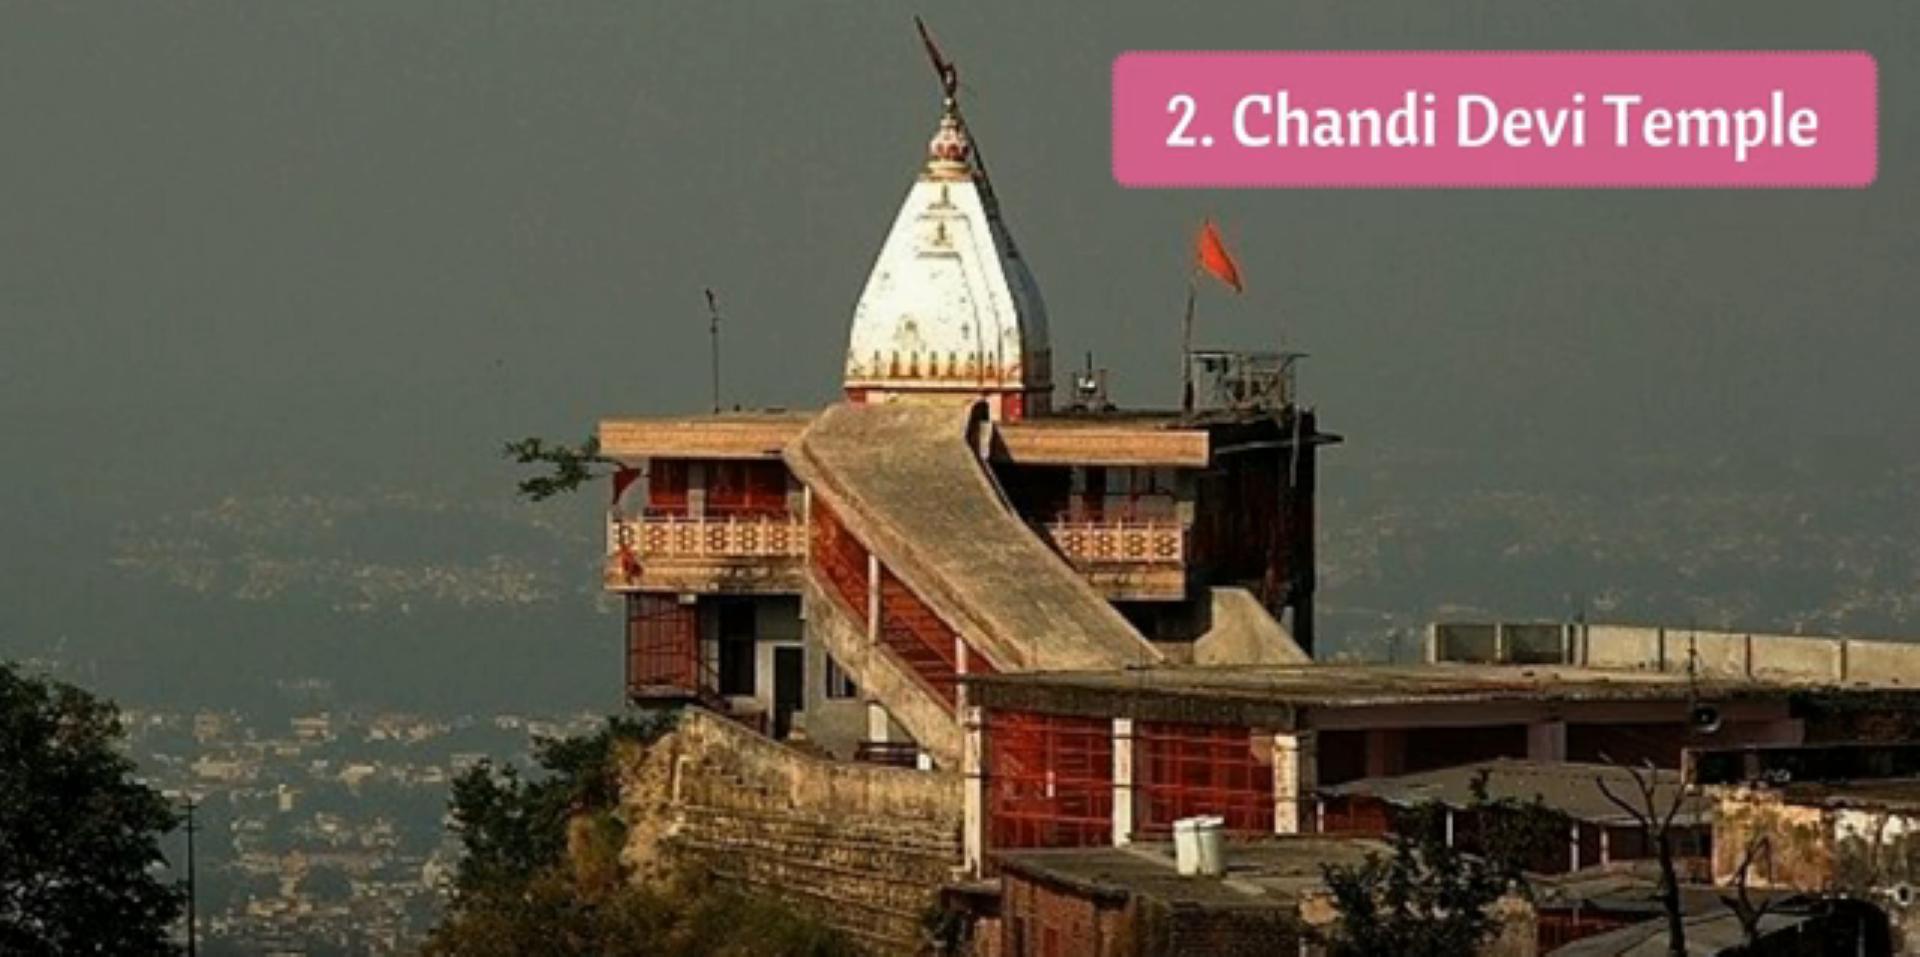 Chandi Devi Temple tour by tempo traveller